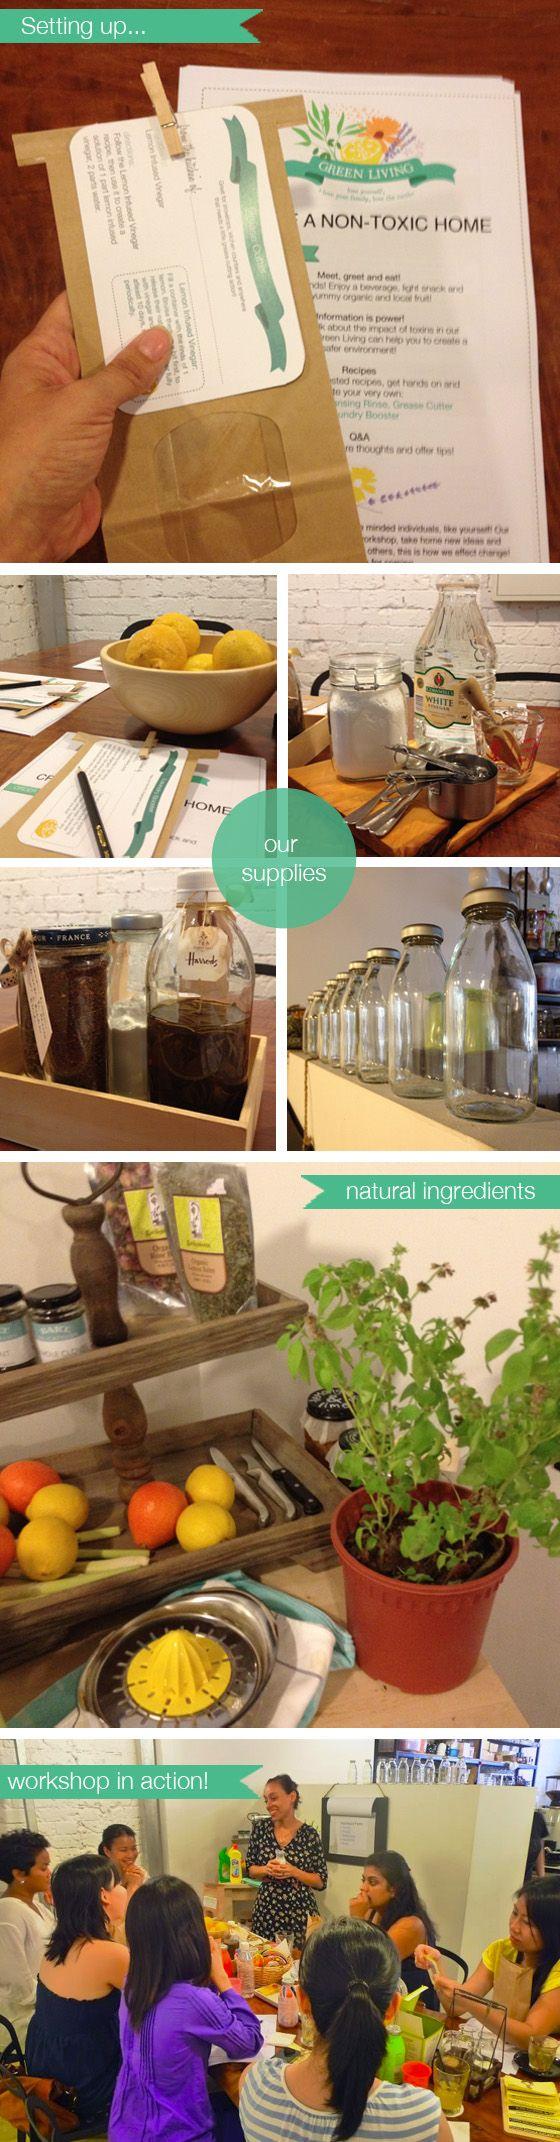 Fotografía - Green Living Diversión Taller!